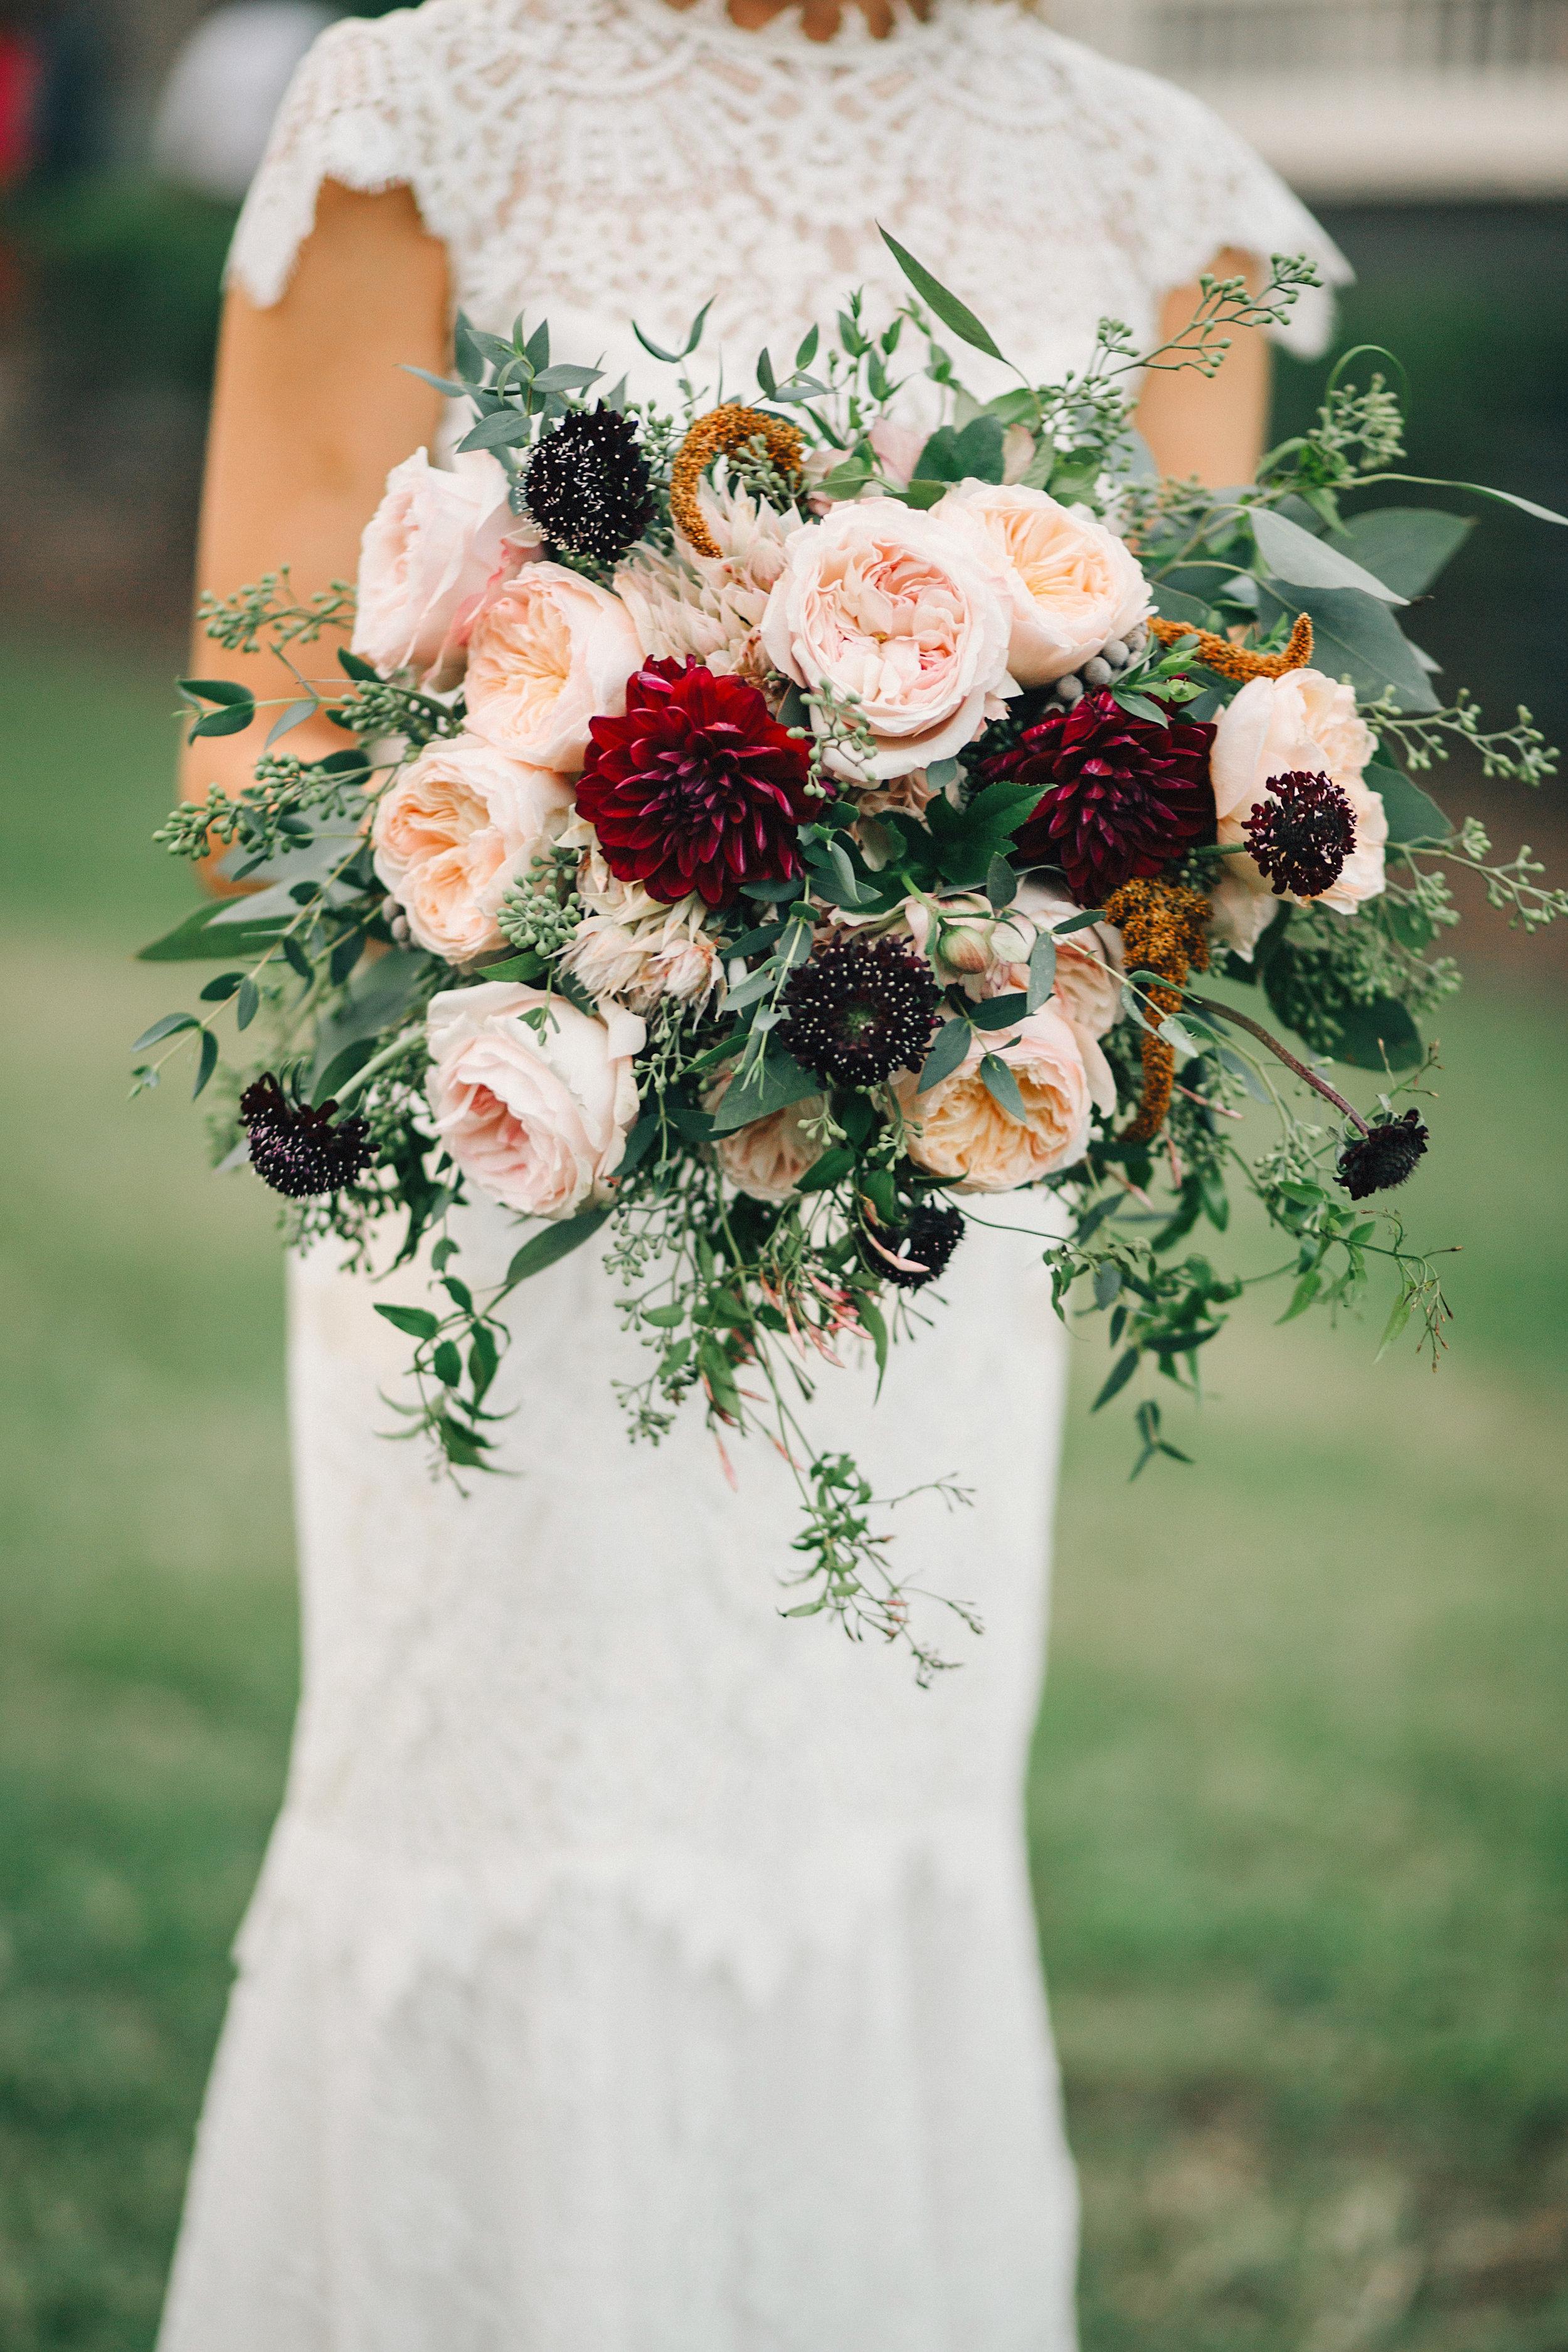 Lush, organic bridal bouquet with burgundy dahlias, peach garden roses, and trailing greenery // Nashville Wedding Floral Design